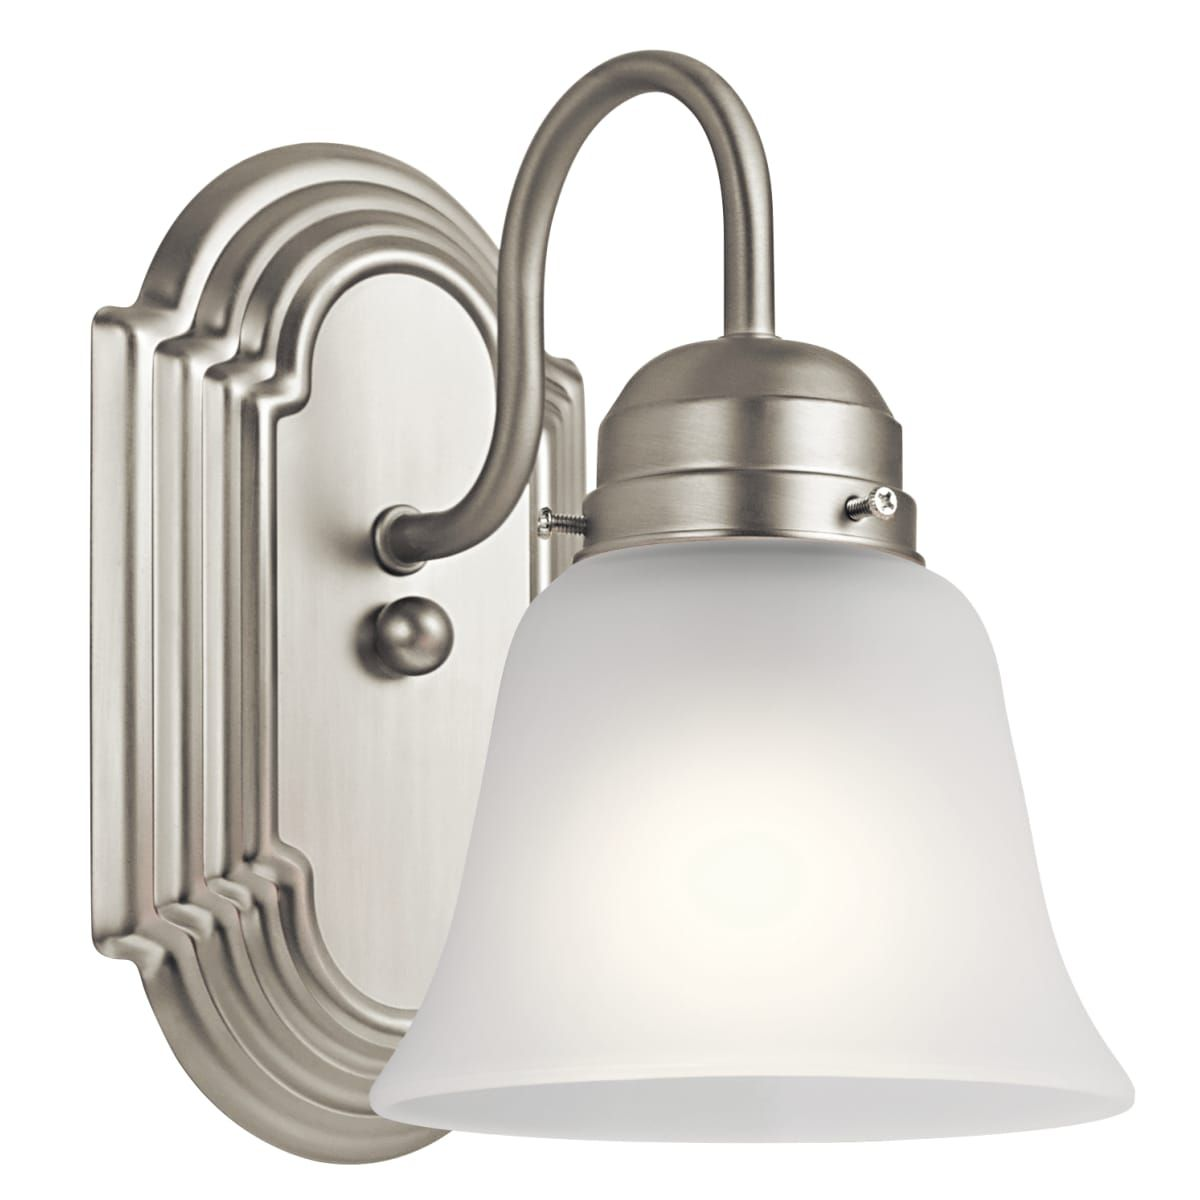 Kichler 5334s Sconces Wall Lights Wall Sconce Lighting